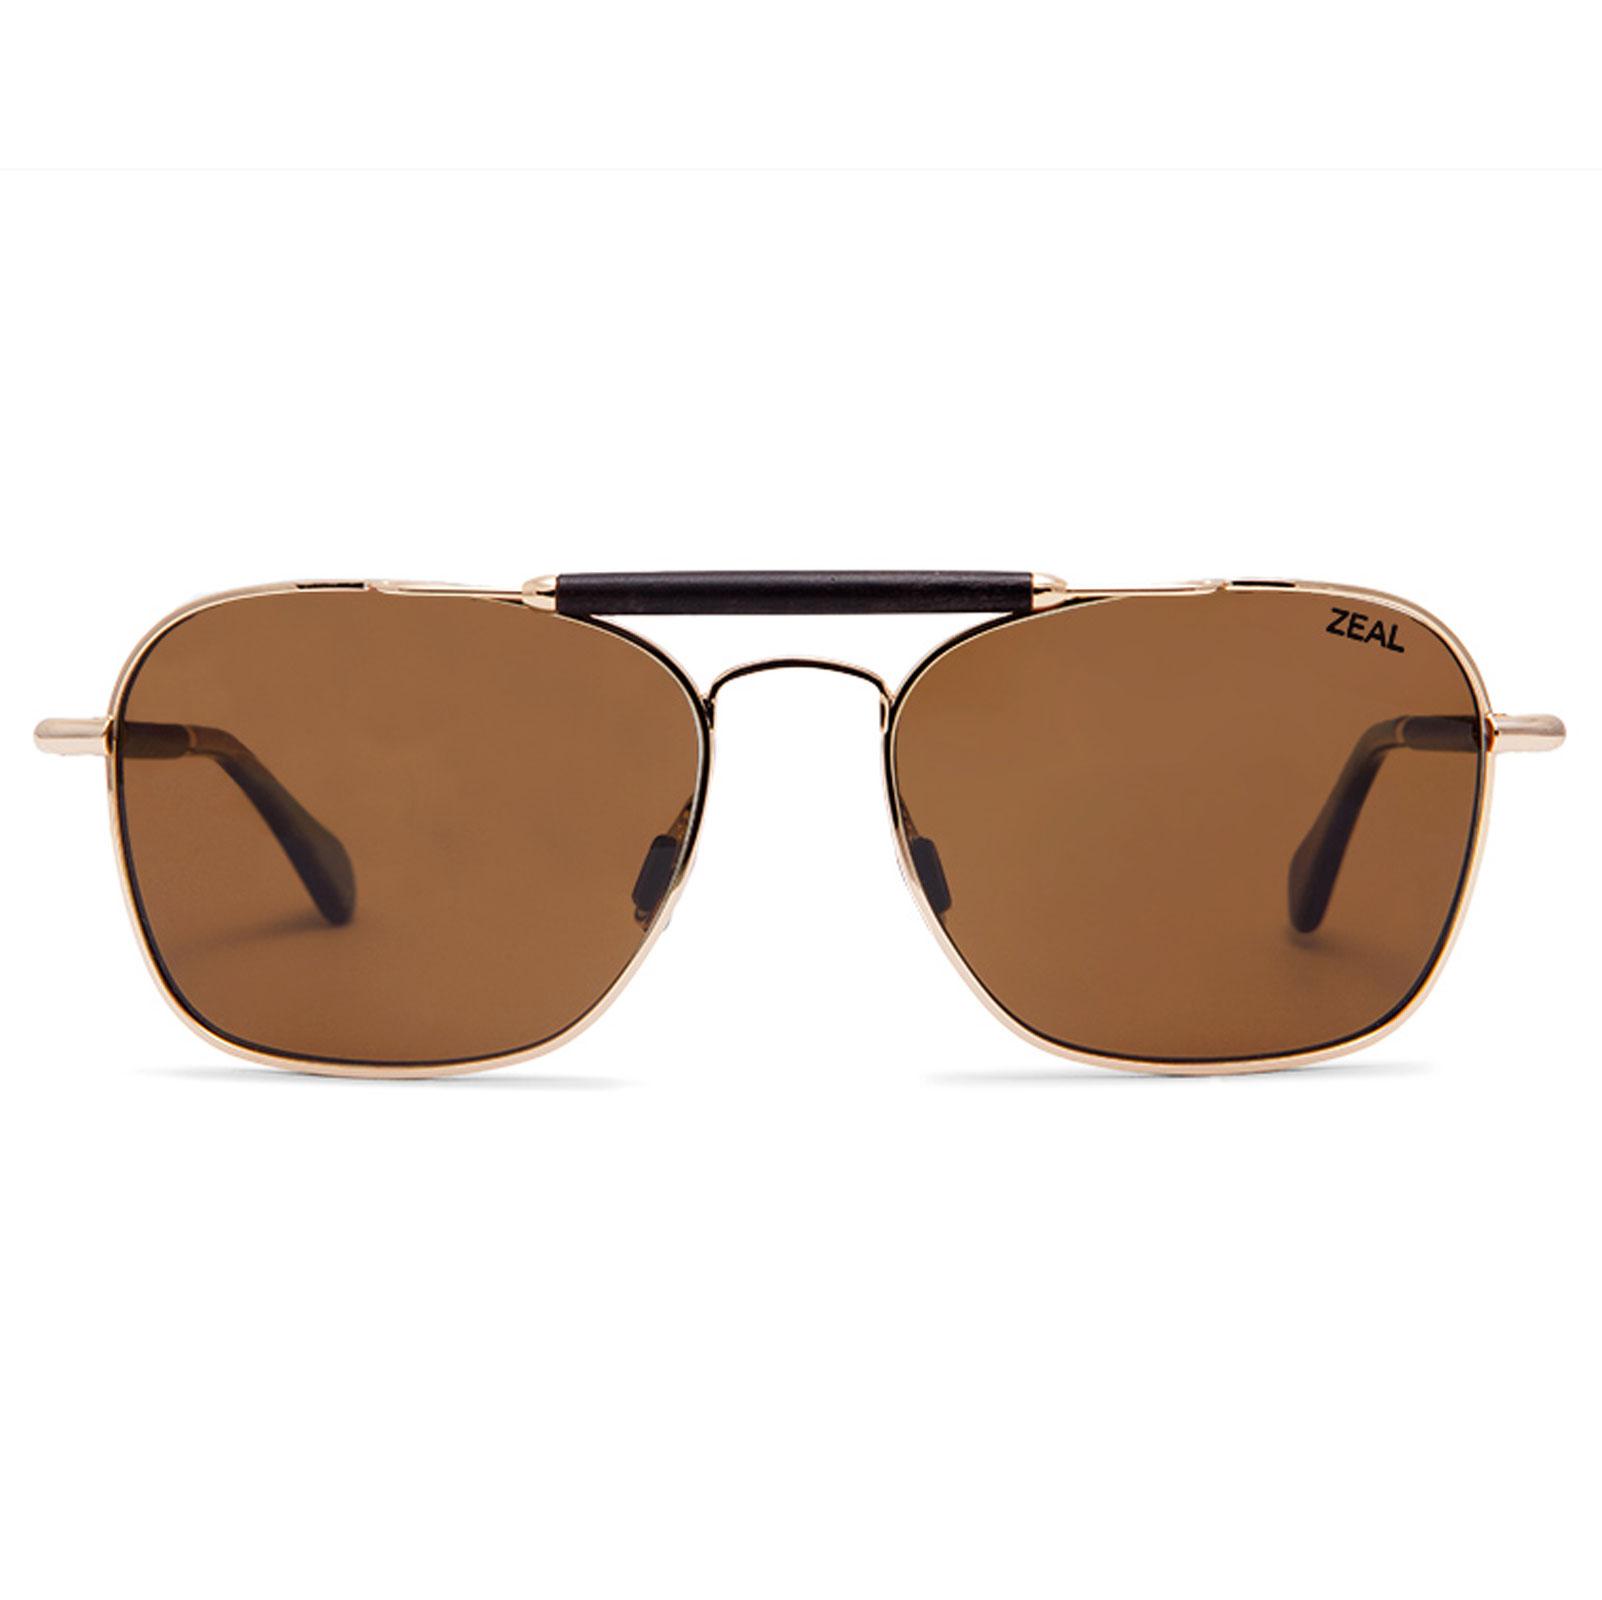 dd89b0aa00 Zeal Optics Draper Sunglasses Eyewear UV Protection Polarized Durable